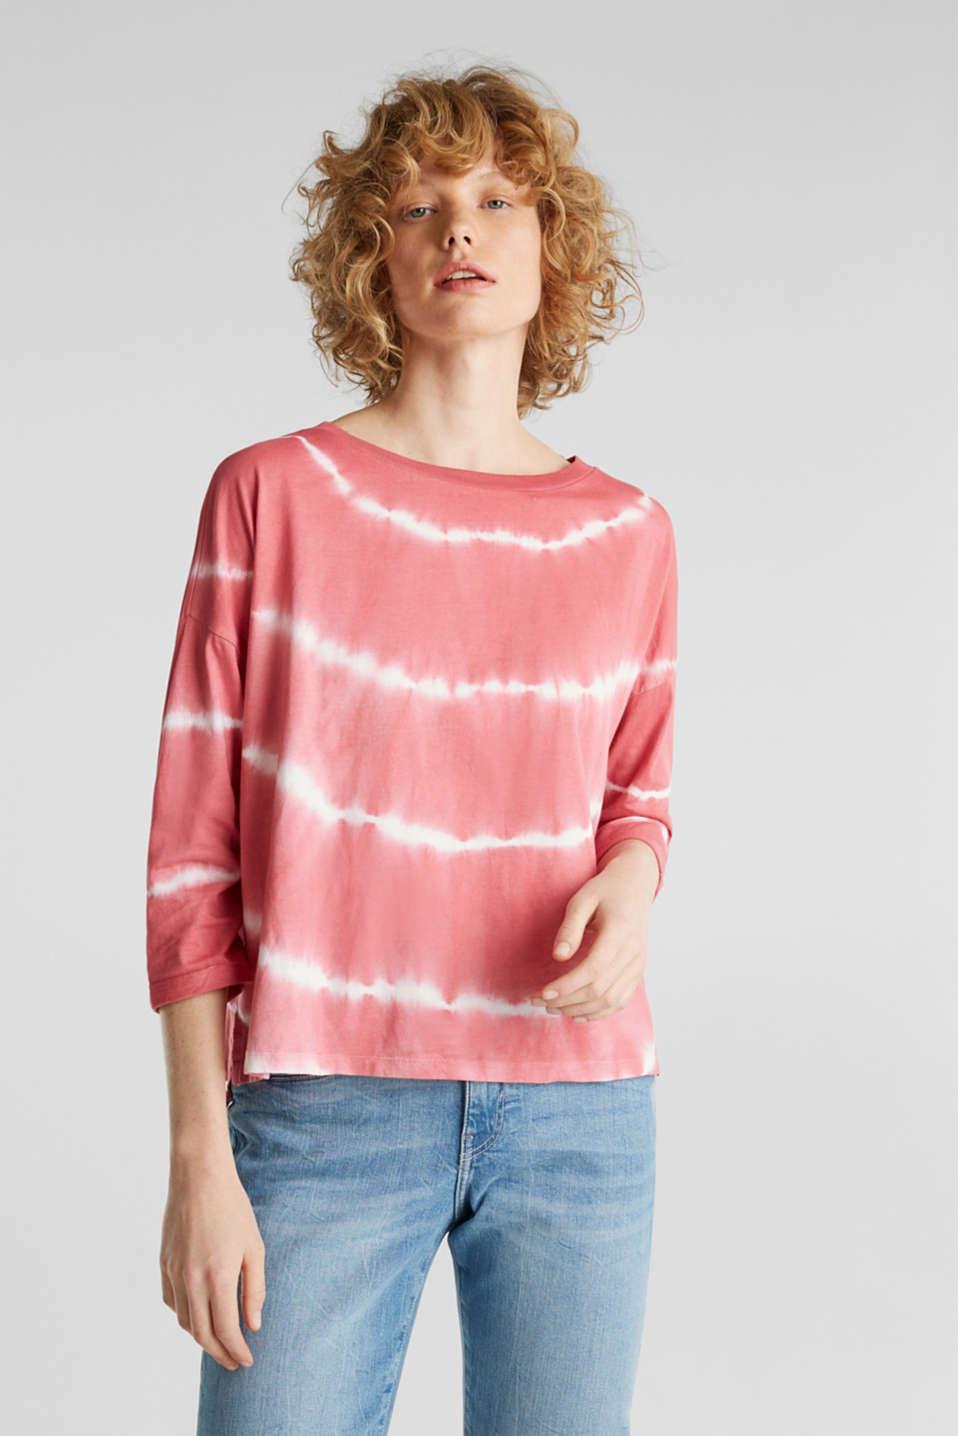 Oversized top in a batik look, 100% cotton